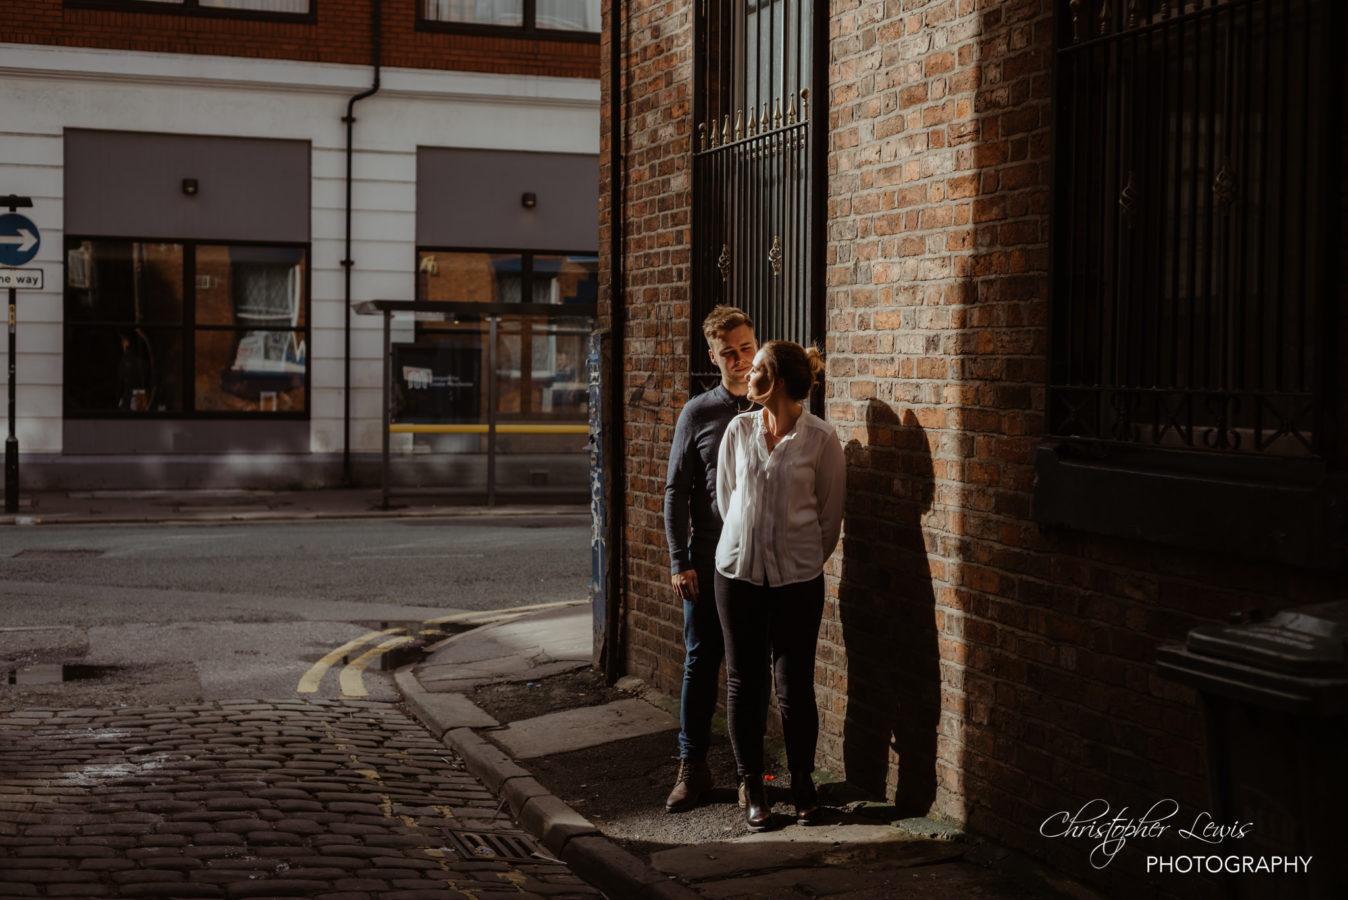 Northern-Quarter-Manchester-Pre-Wedding-Photoshoot-15